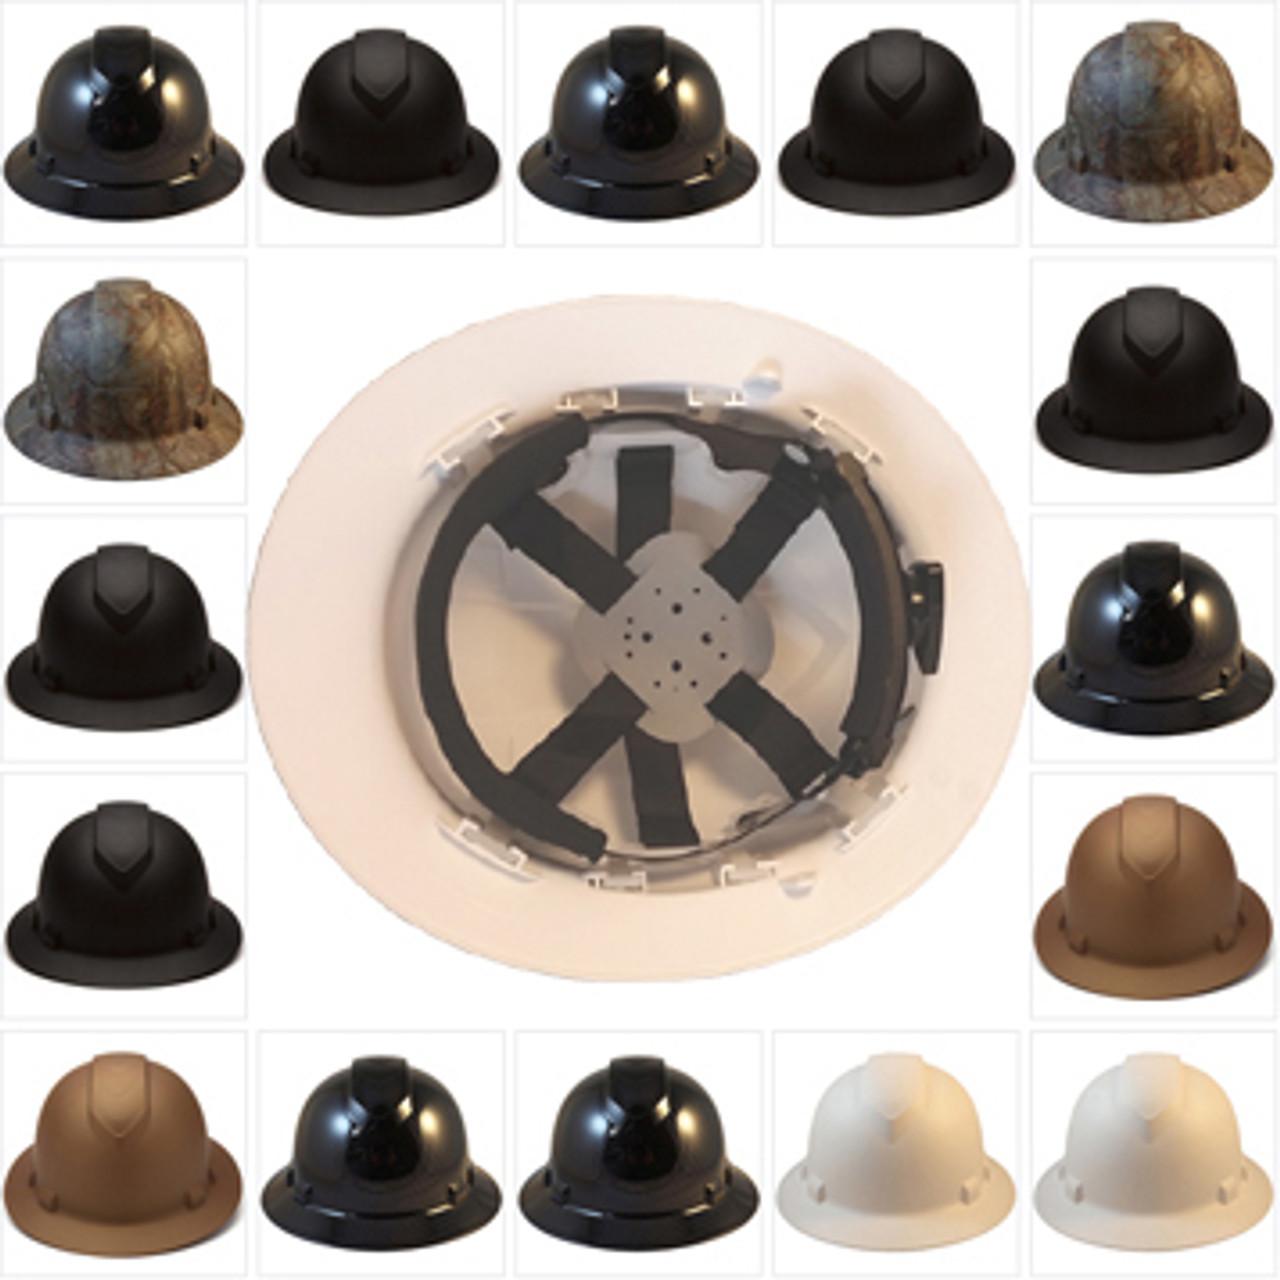 Pyramex RIDGELINE Full Brim Safety Helmets - 6 Point Ratchet Liners - All  Patterns